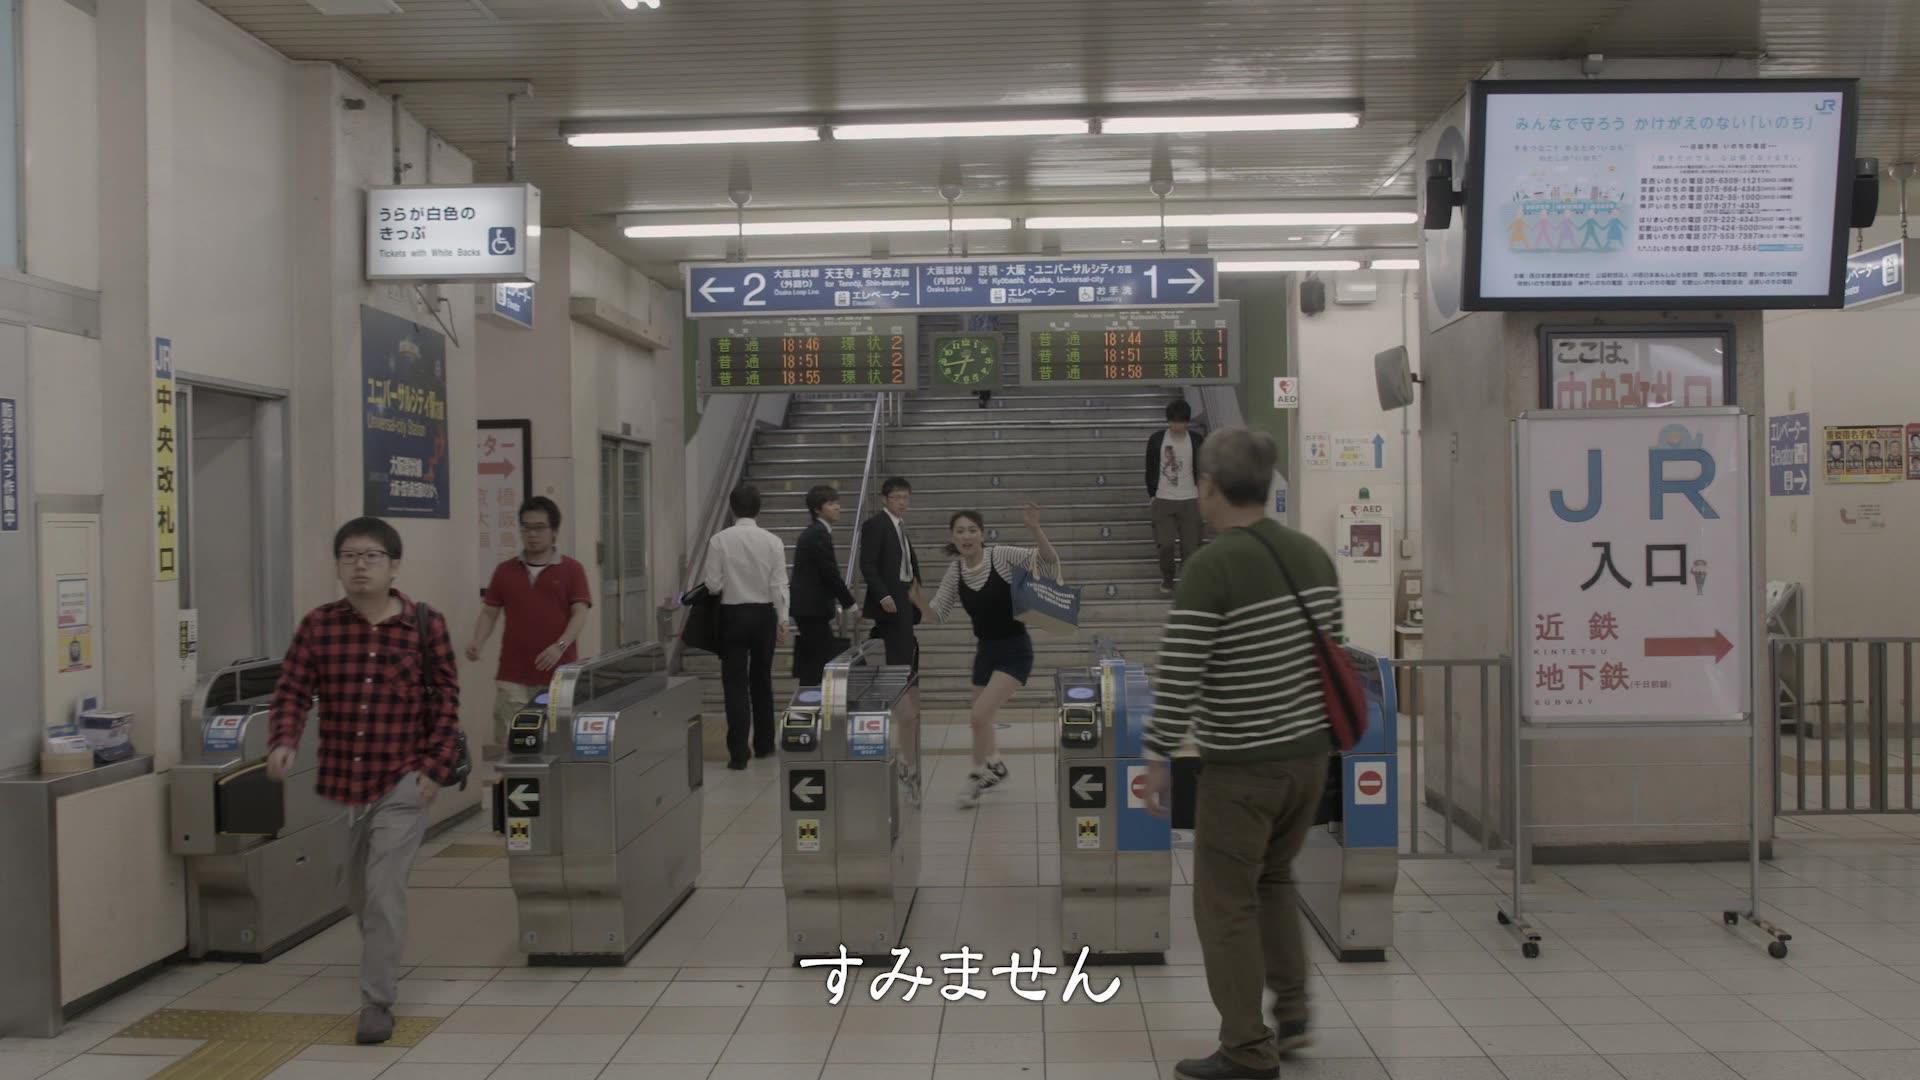 Osaka Loop Line 2 Episode 1